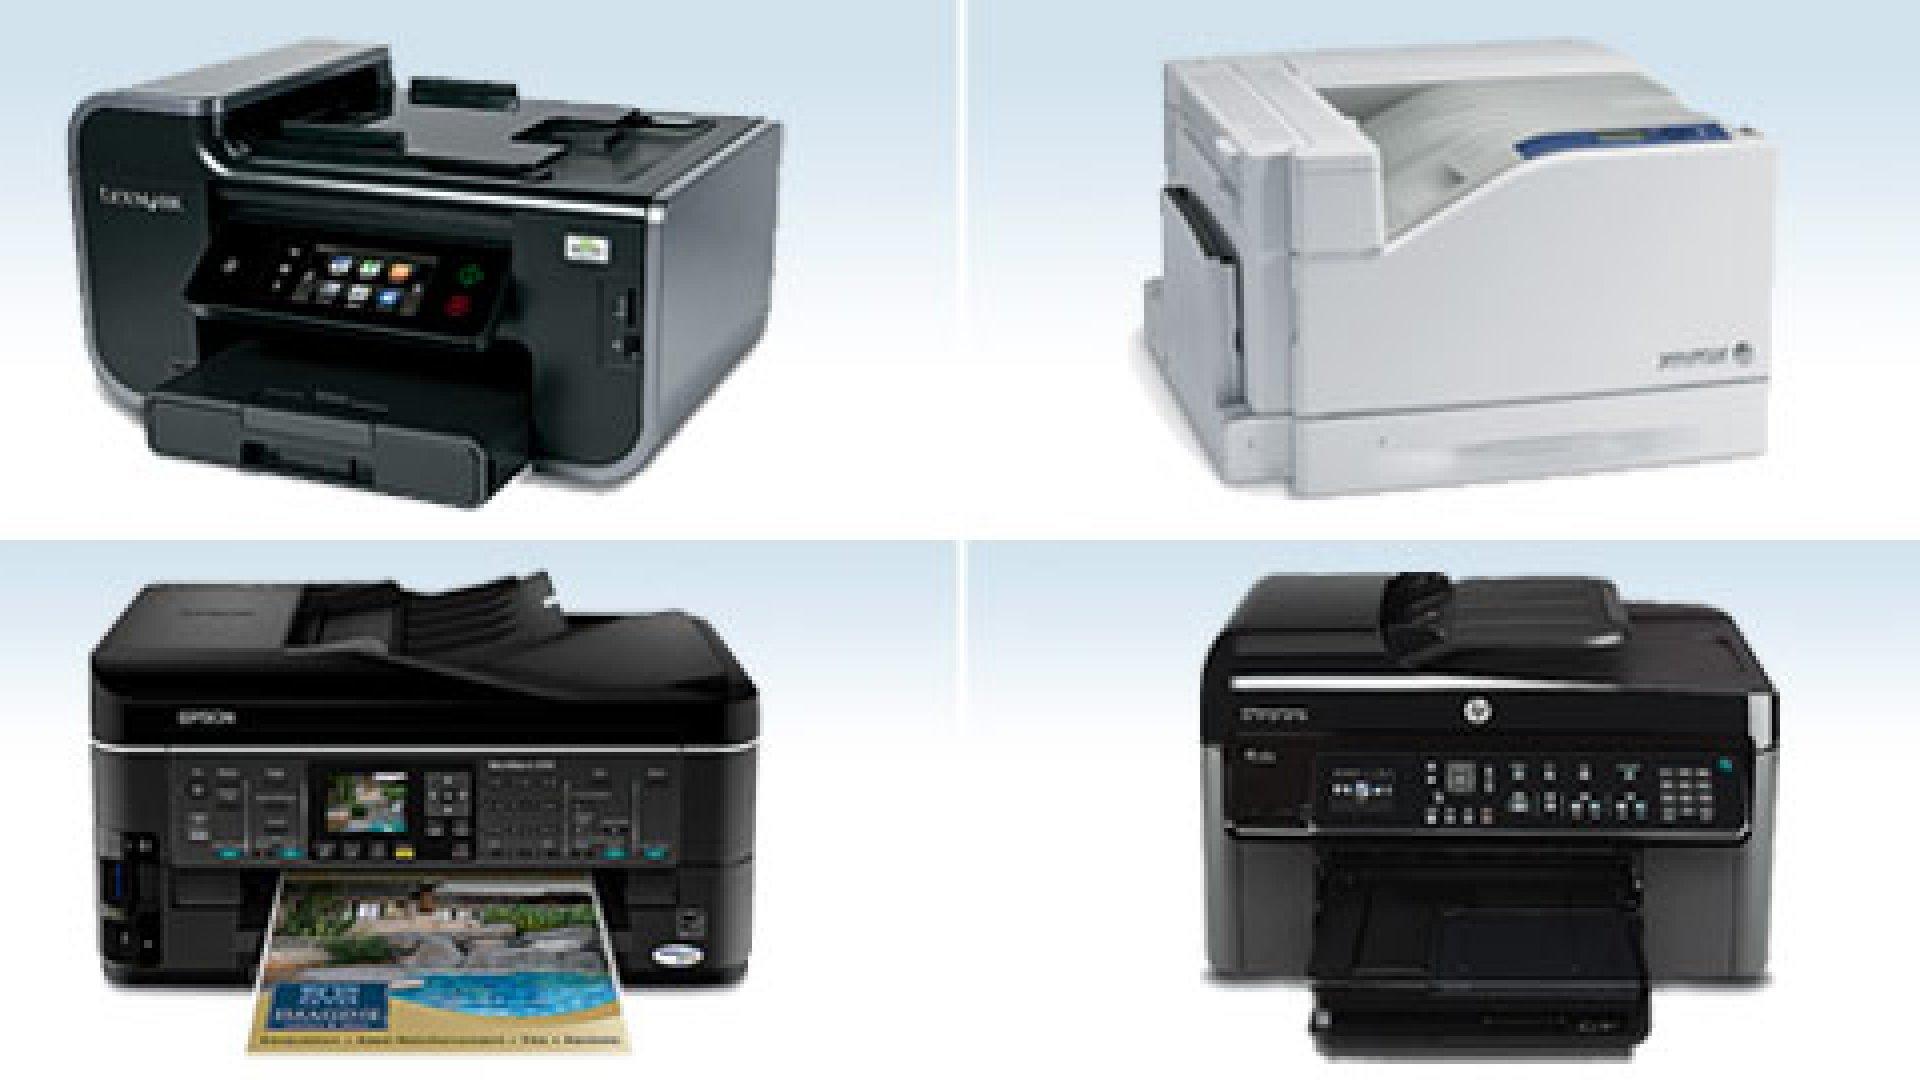 4 New Web-Based Printers